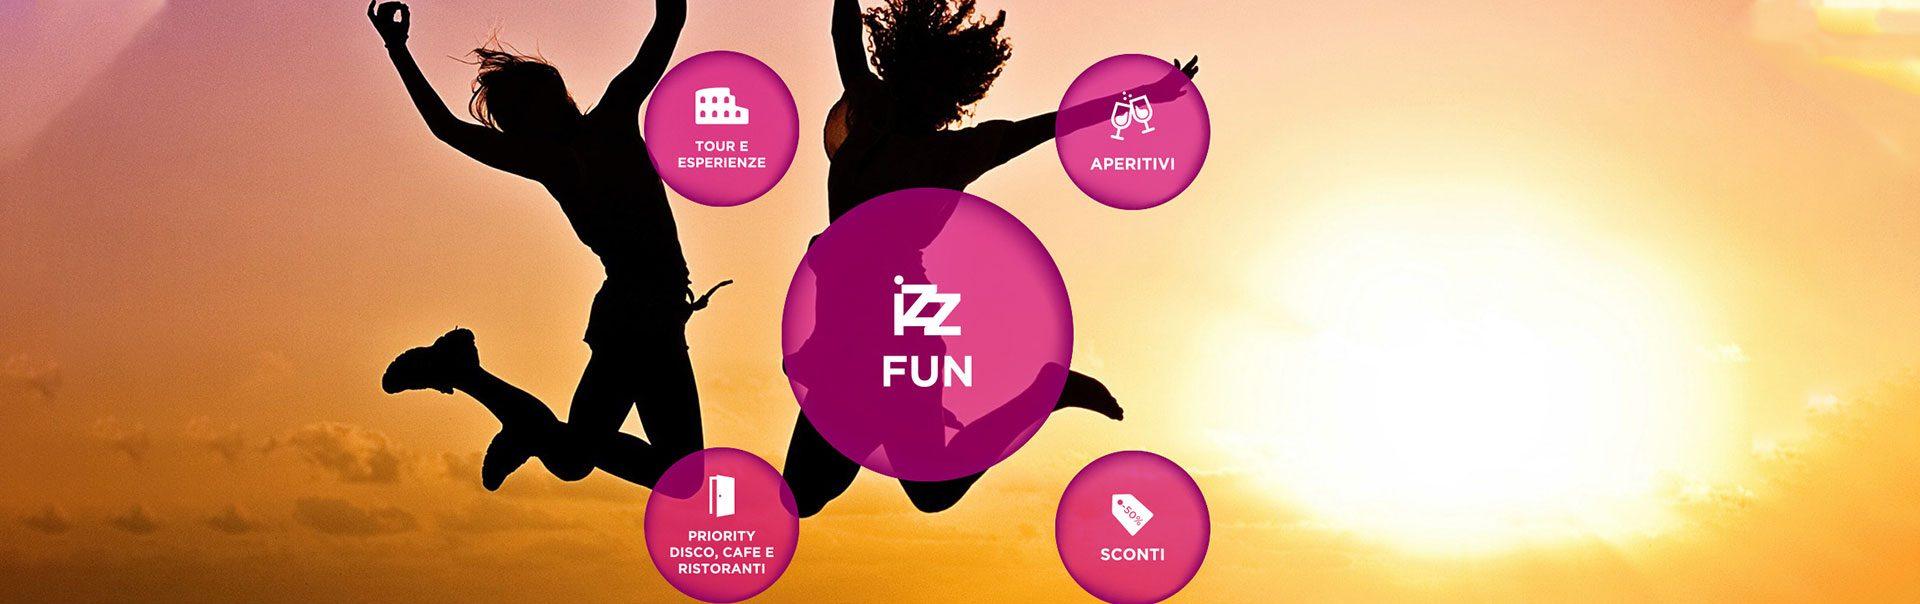 izzhome-izzfun-header-22